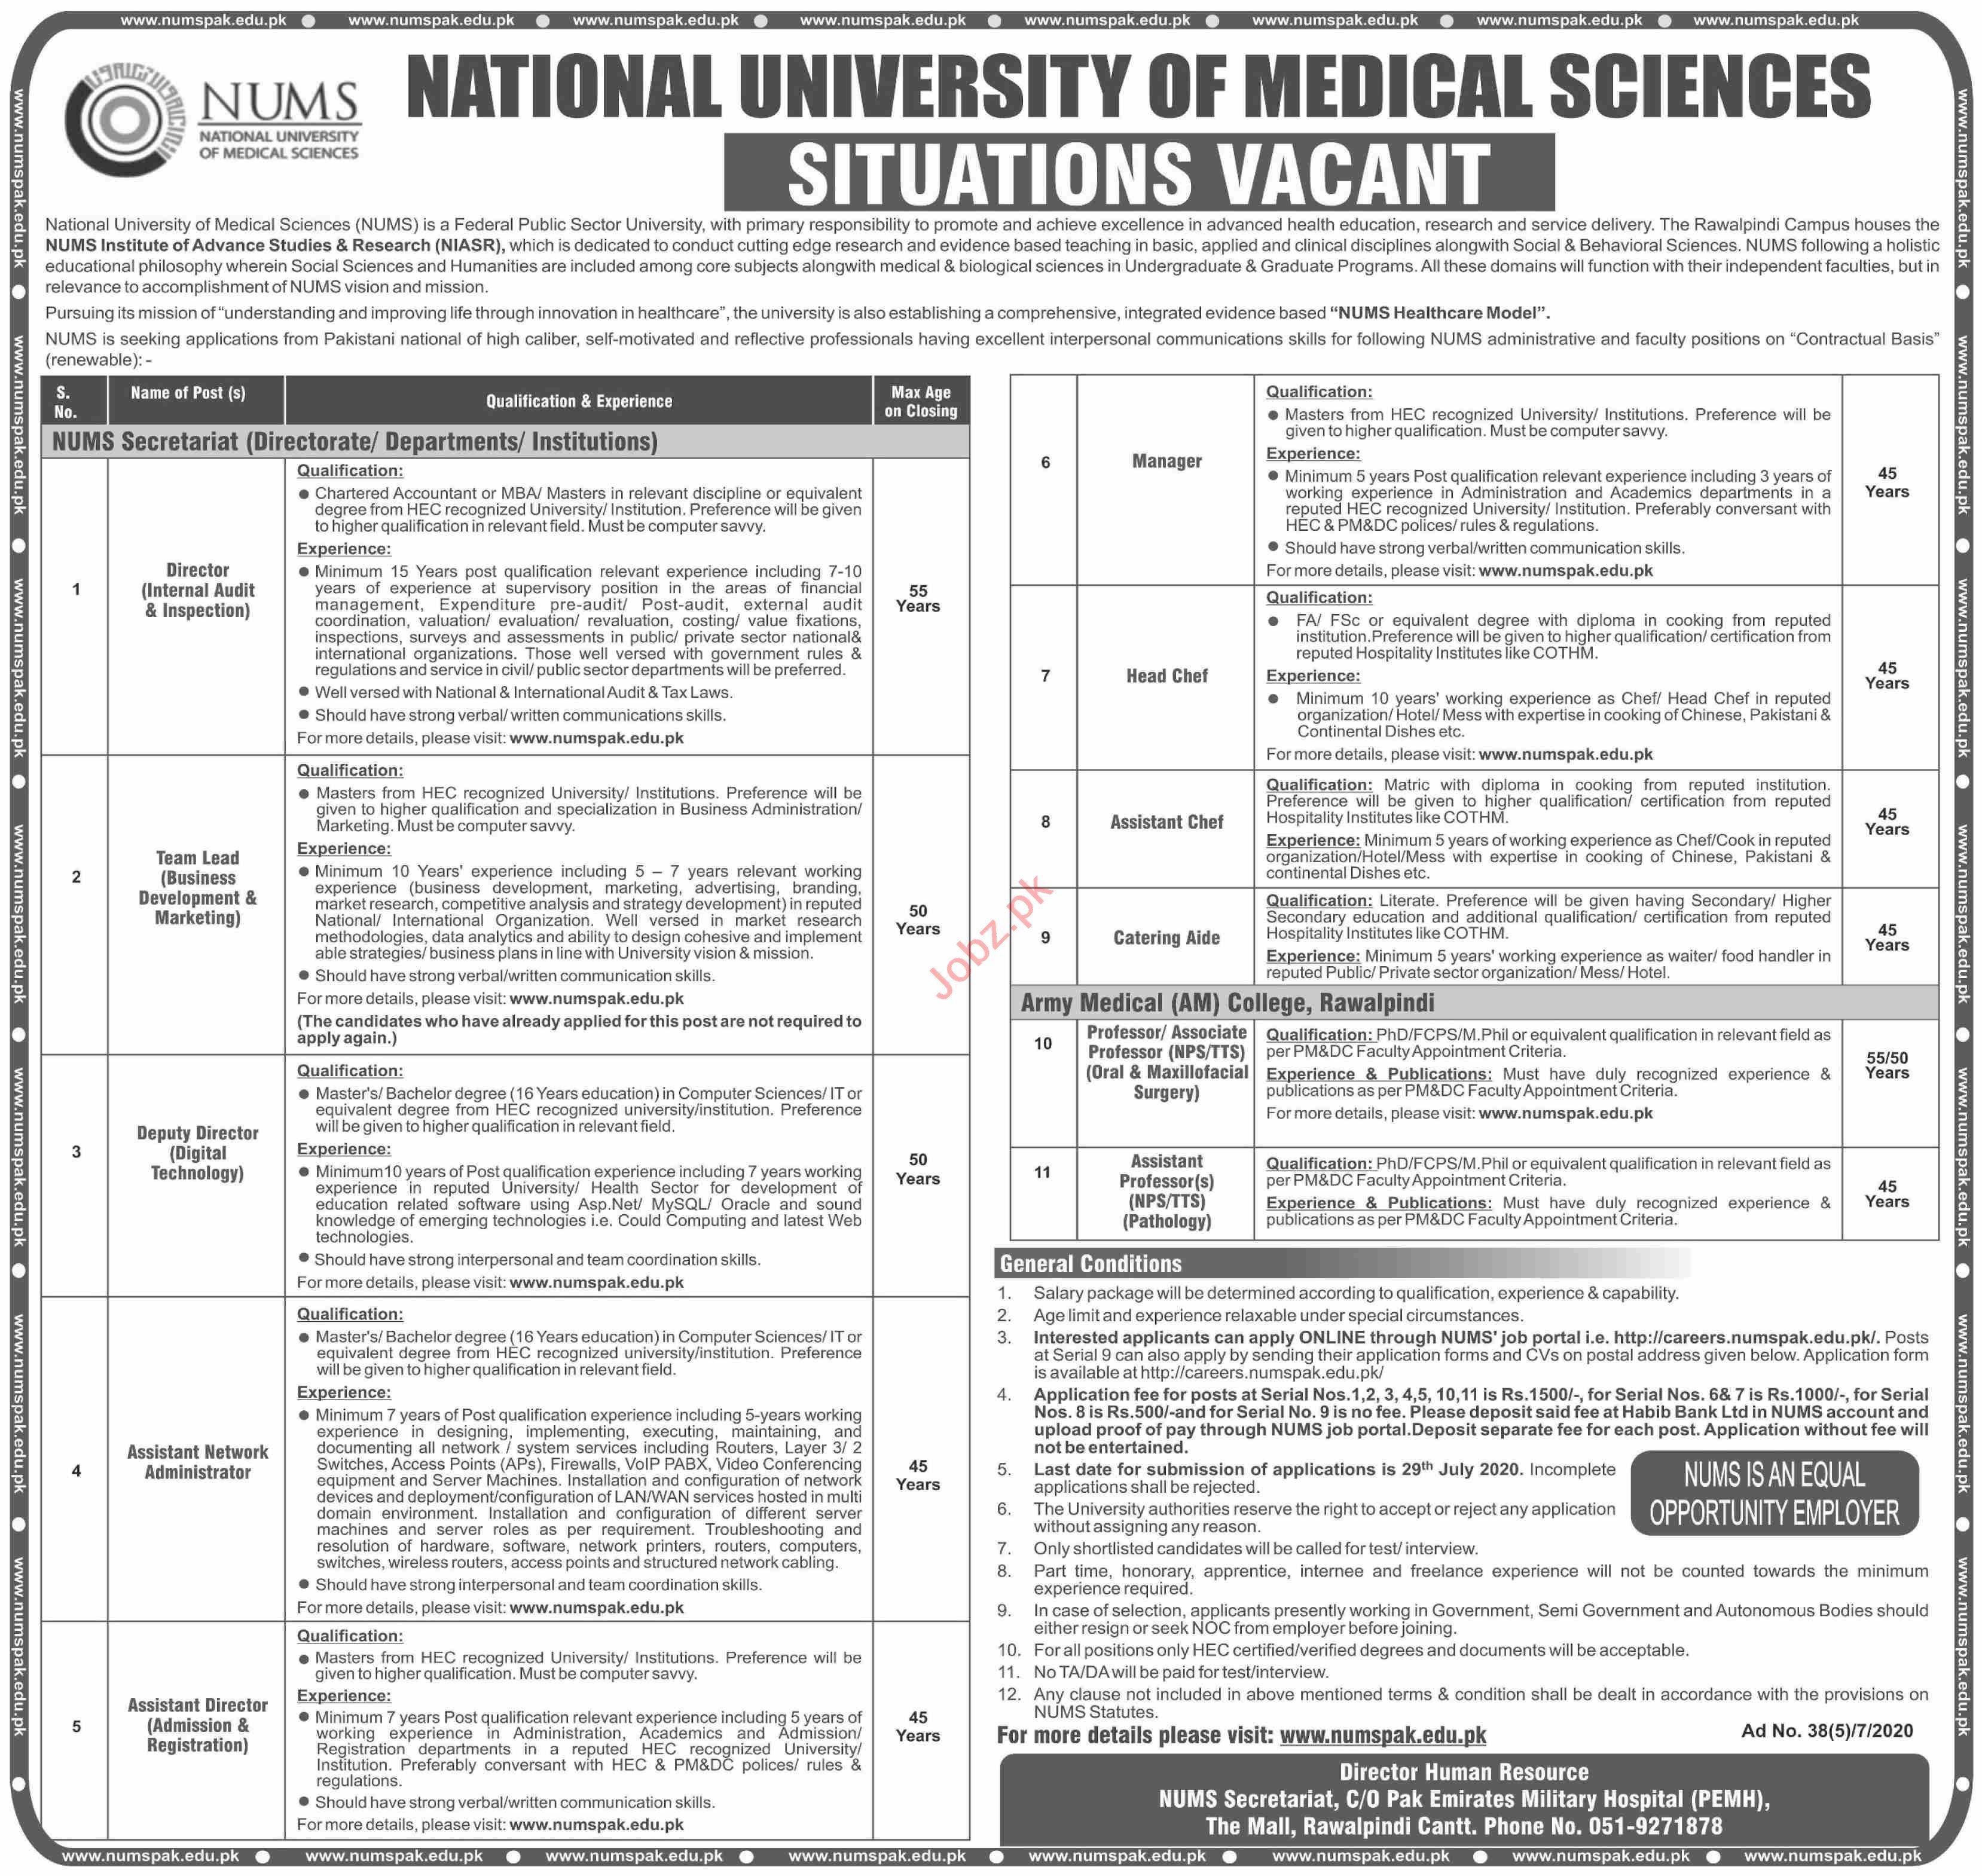 NUST University & Army Medical College AMC Jobs 2020